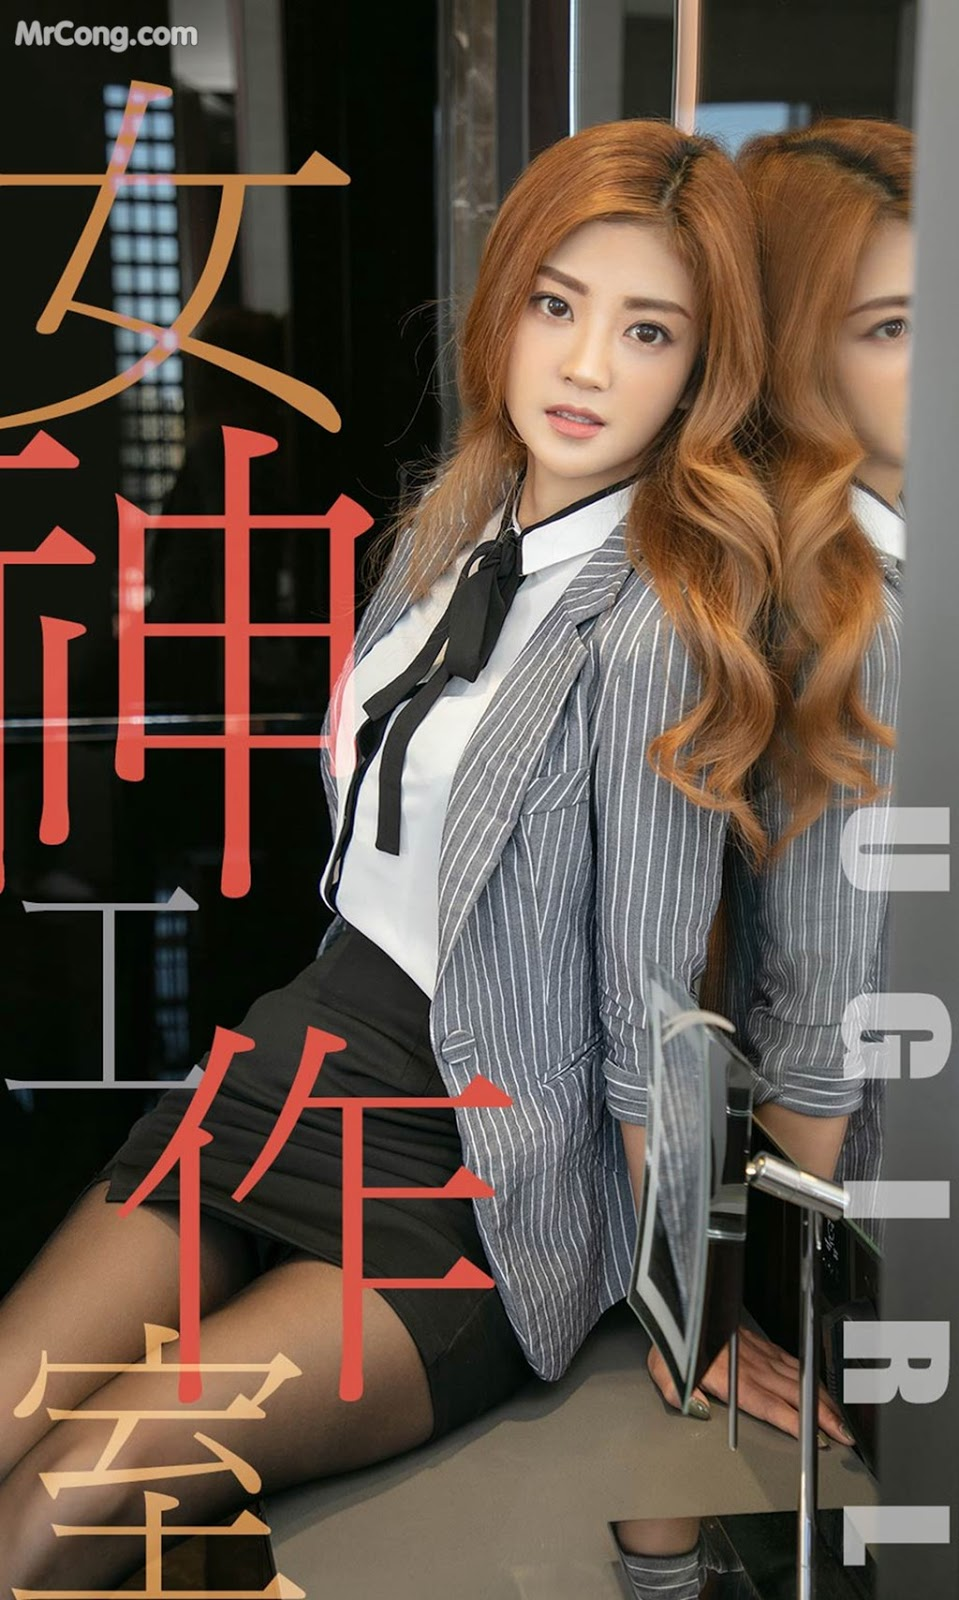 UGIRLS - Ai You Wu App No.1493: Lin Li (琳丽) (35 pictures)